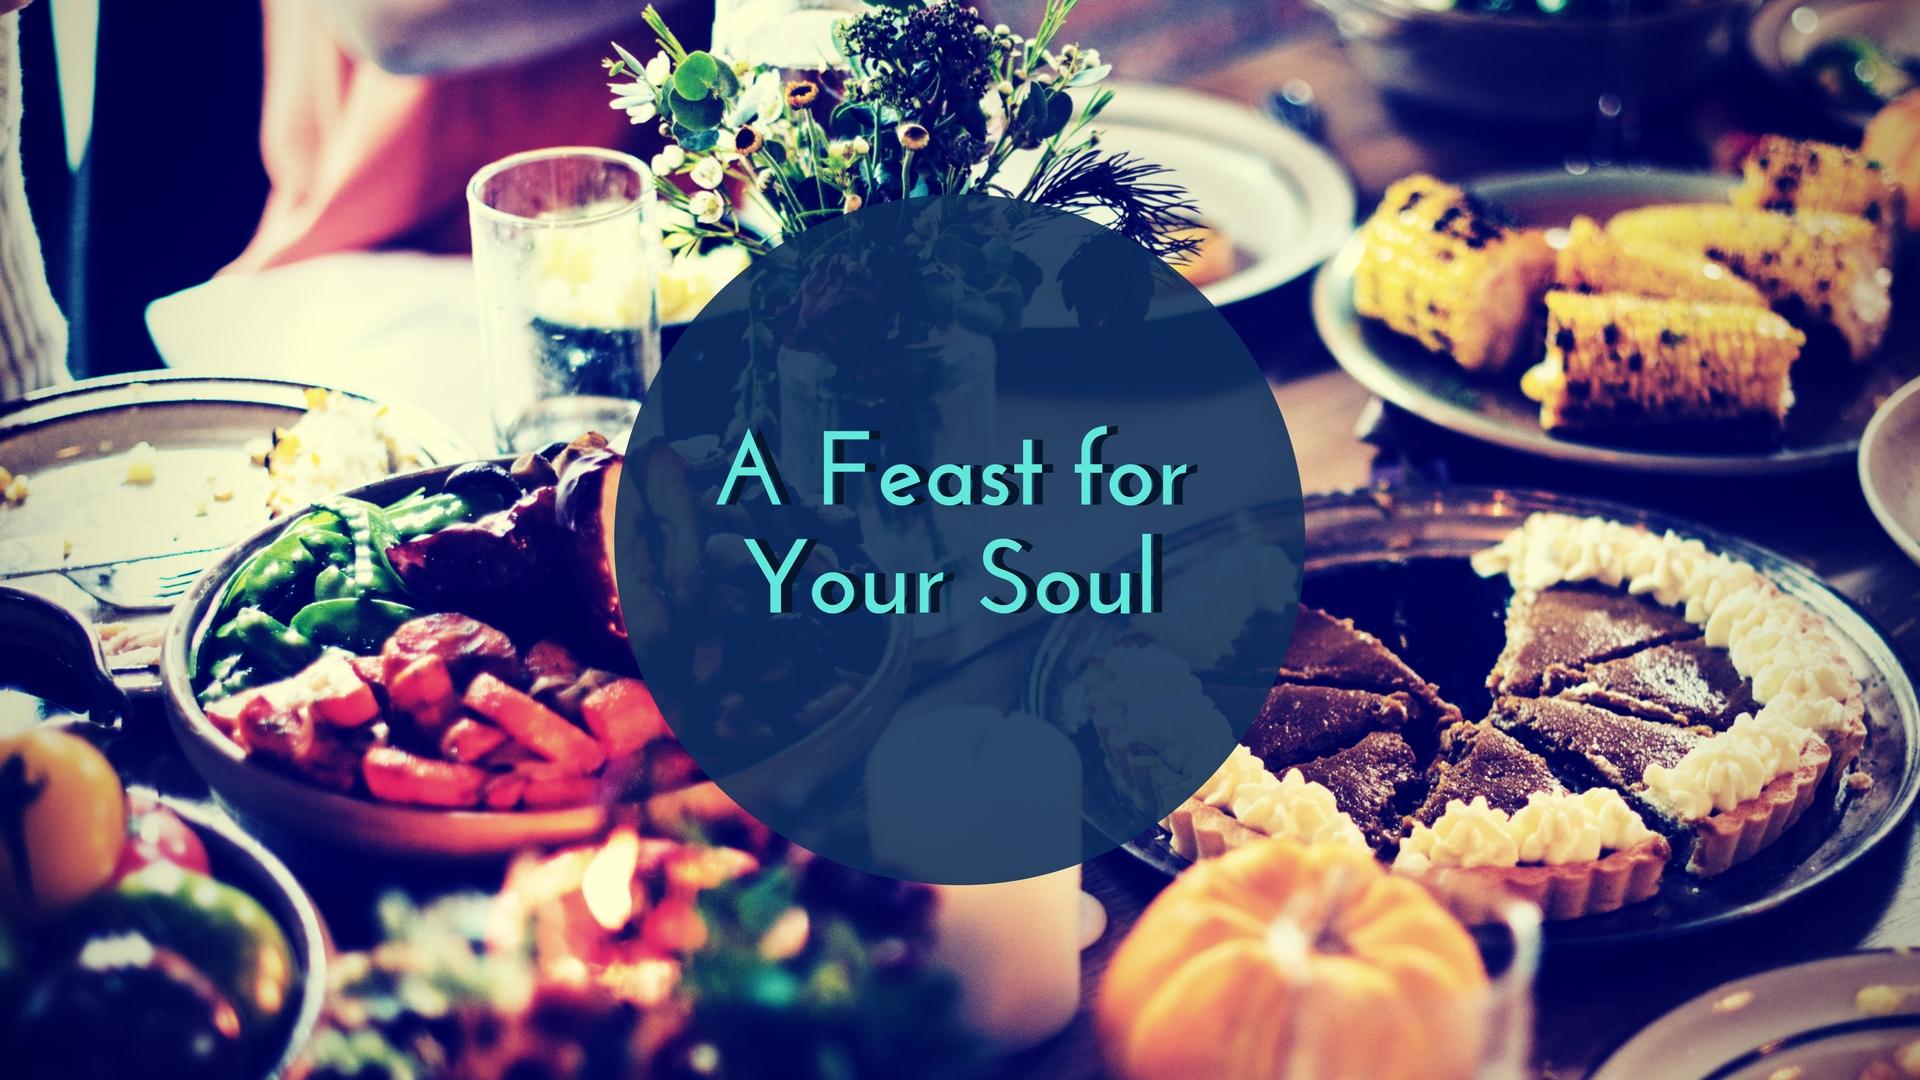 A Feast forYour Soul (1).jpg